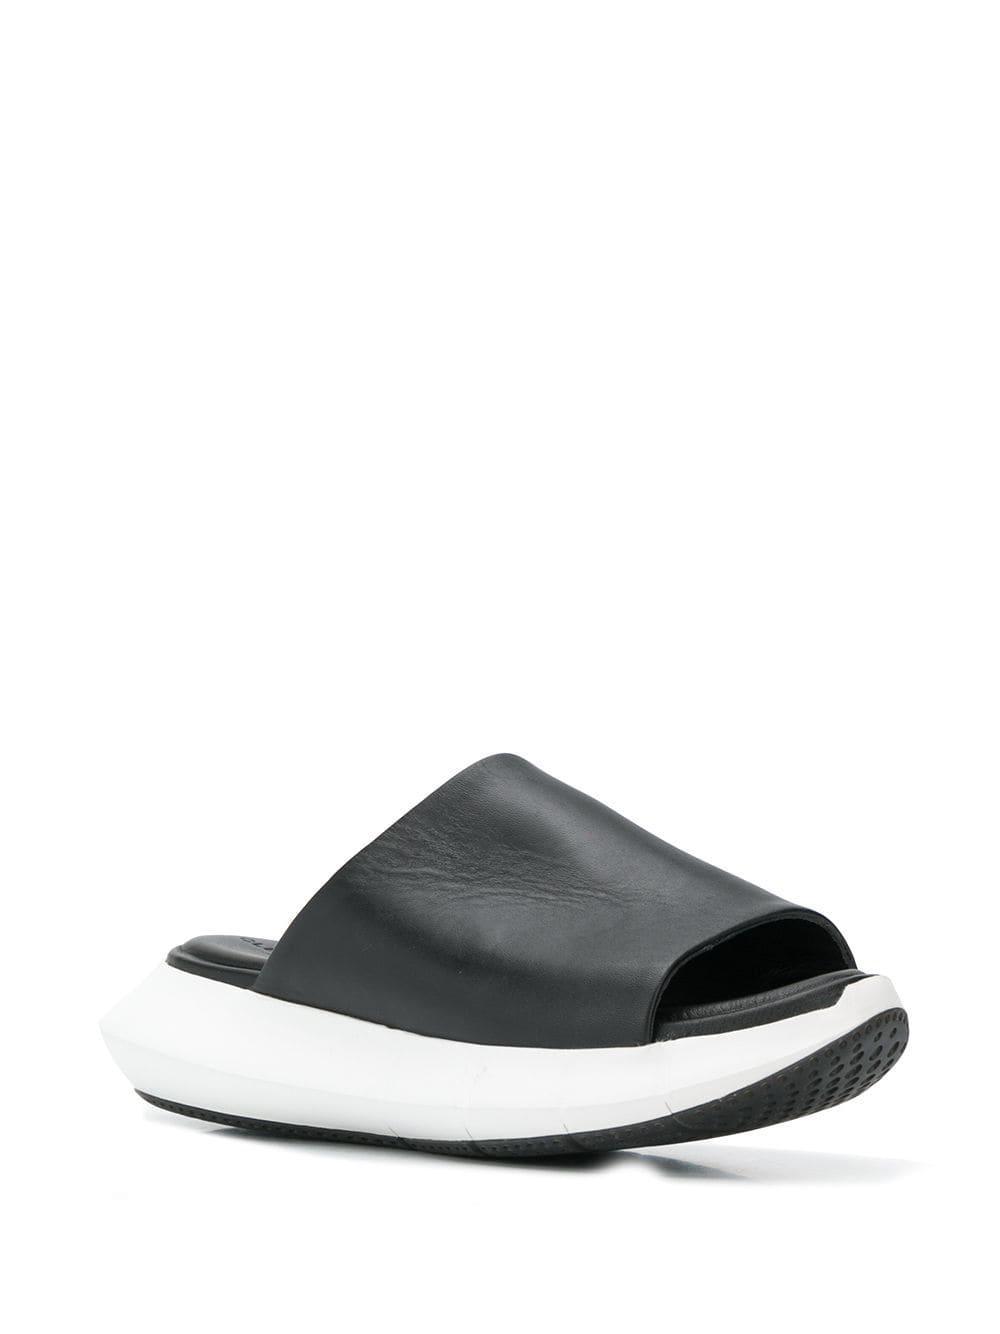 Lyst Save Sandals Clergerie 3 Black Acid In yPNOvm0w8n